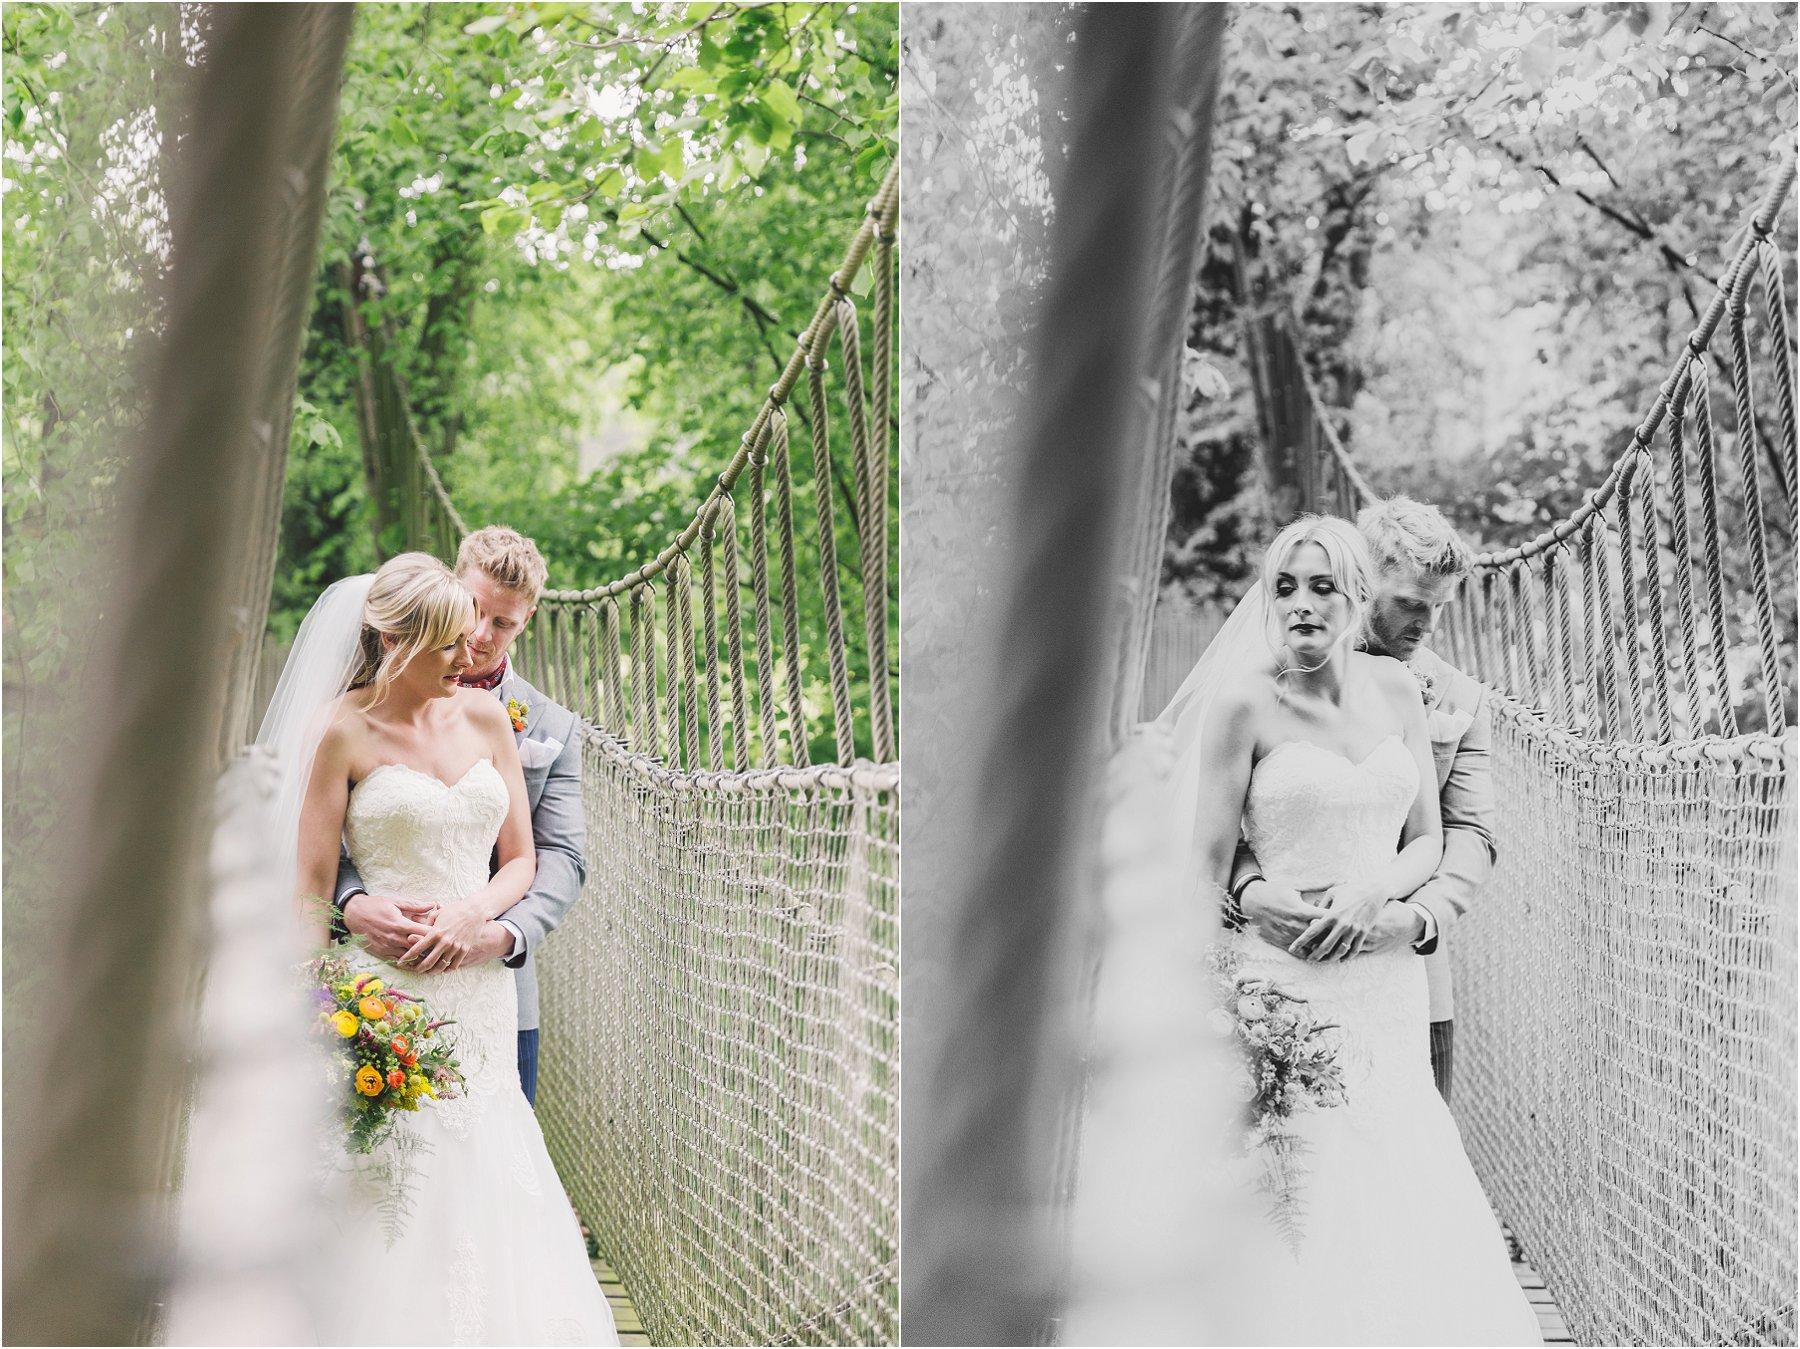 eve.photography.relaxed.creative.wedding.destination._0284.jpg